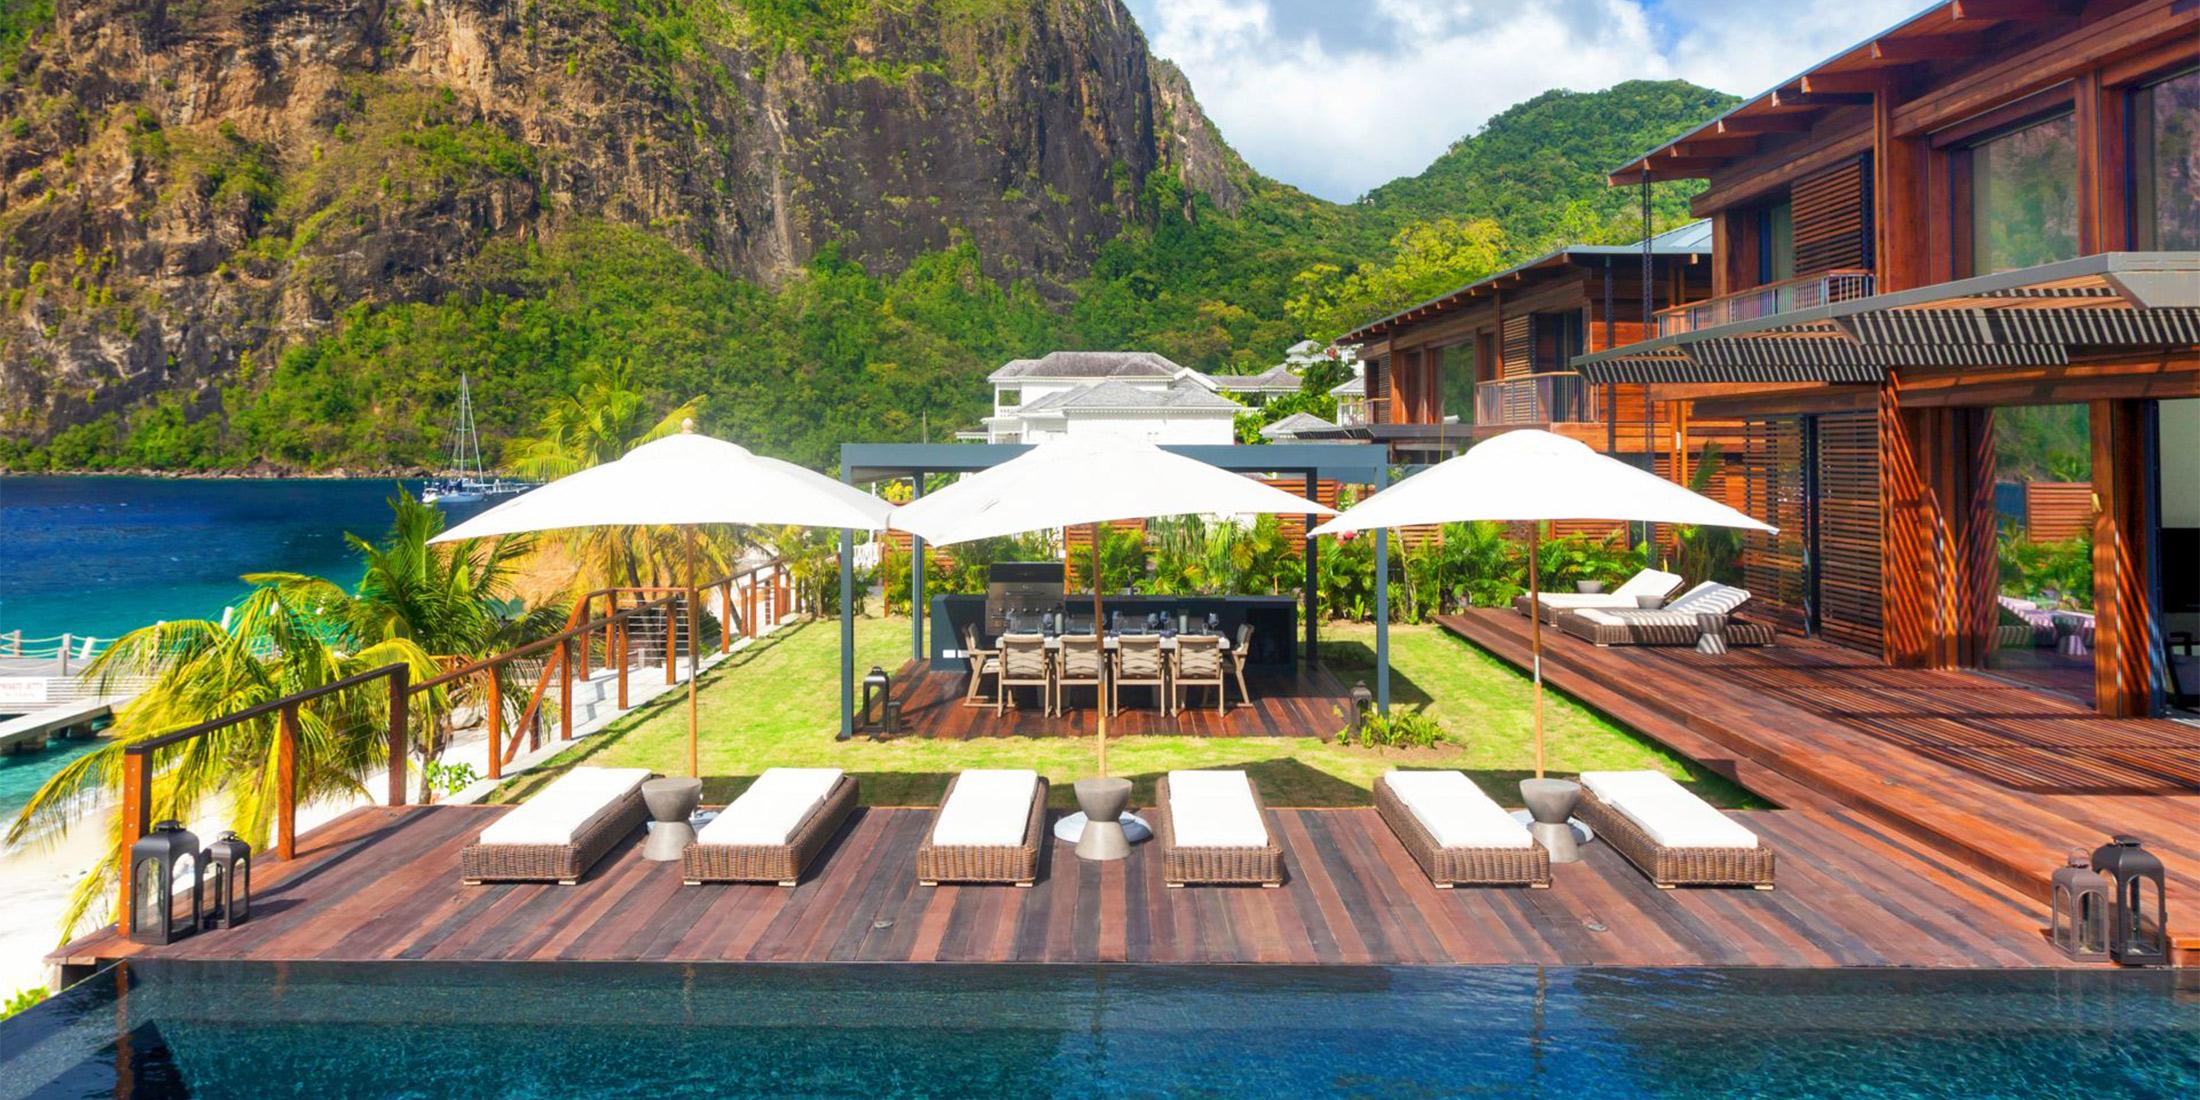 Luxurious Unique Caribbean Suites with Journese